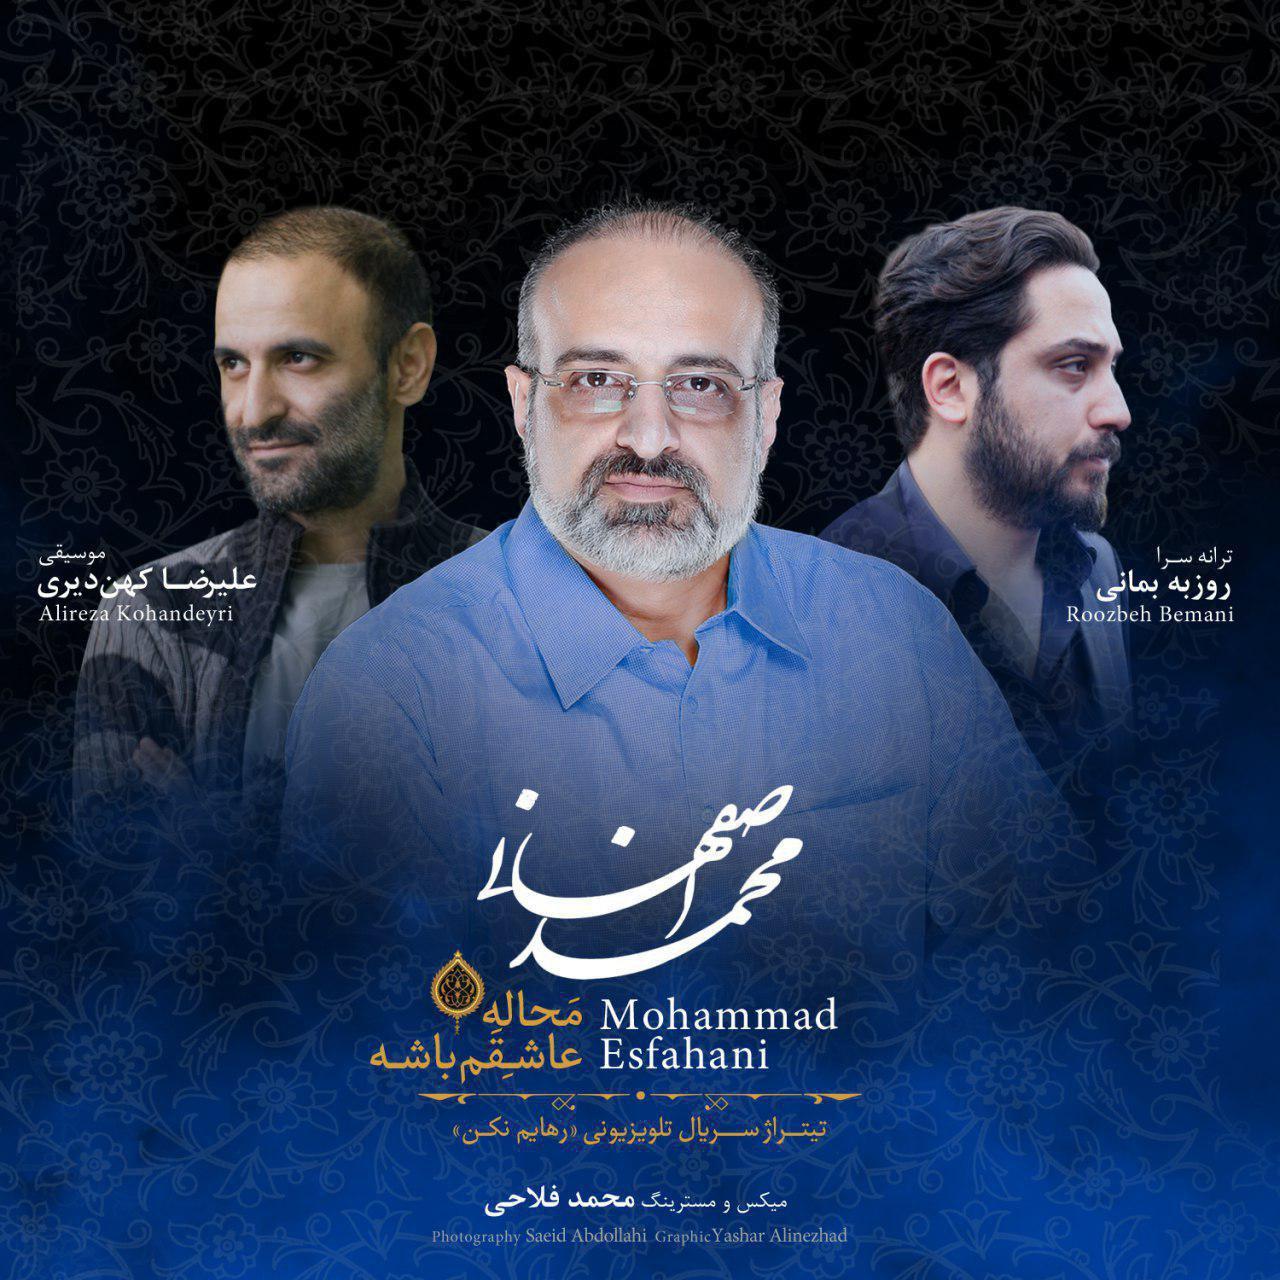 Mohammad Esfahani – Mahaale Ashegham Bashe